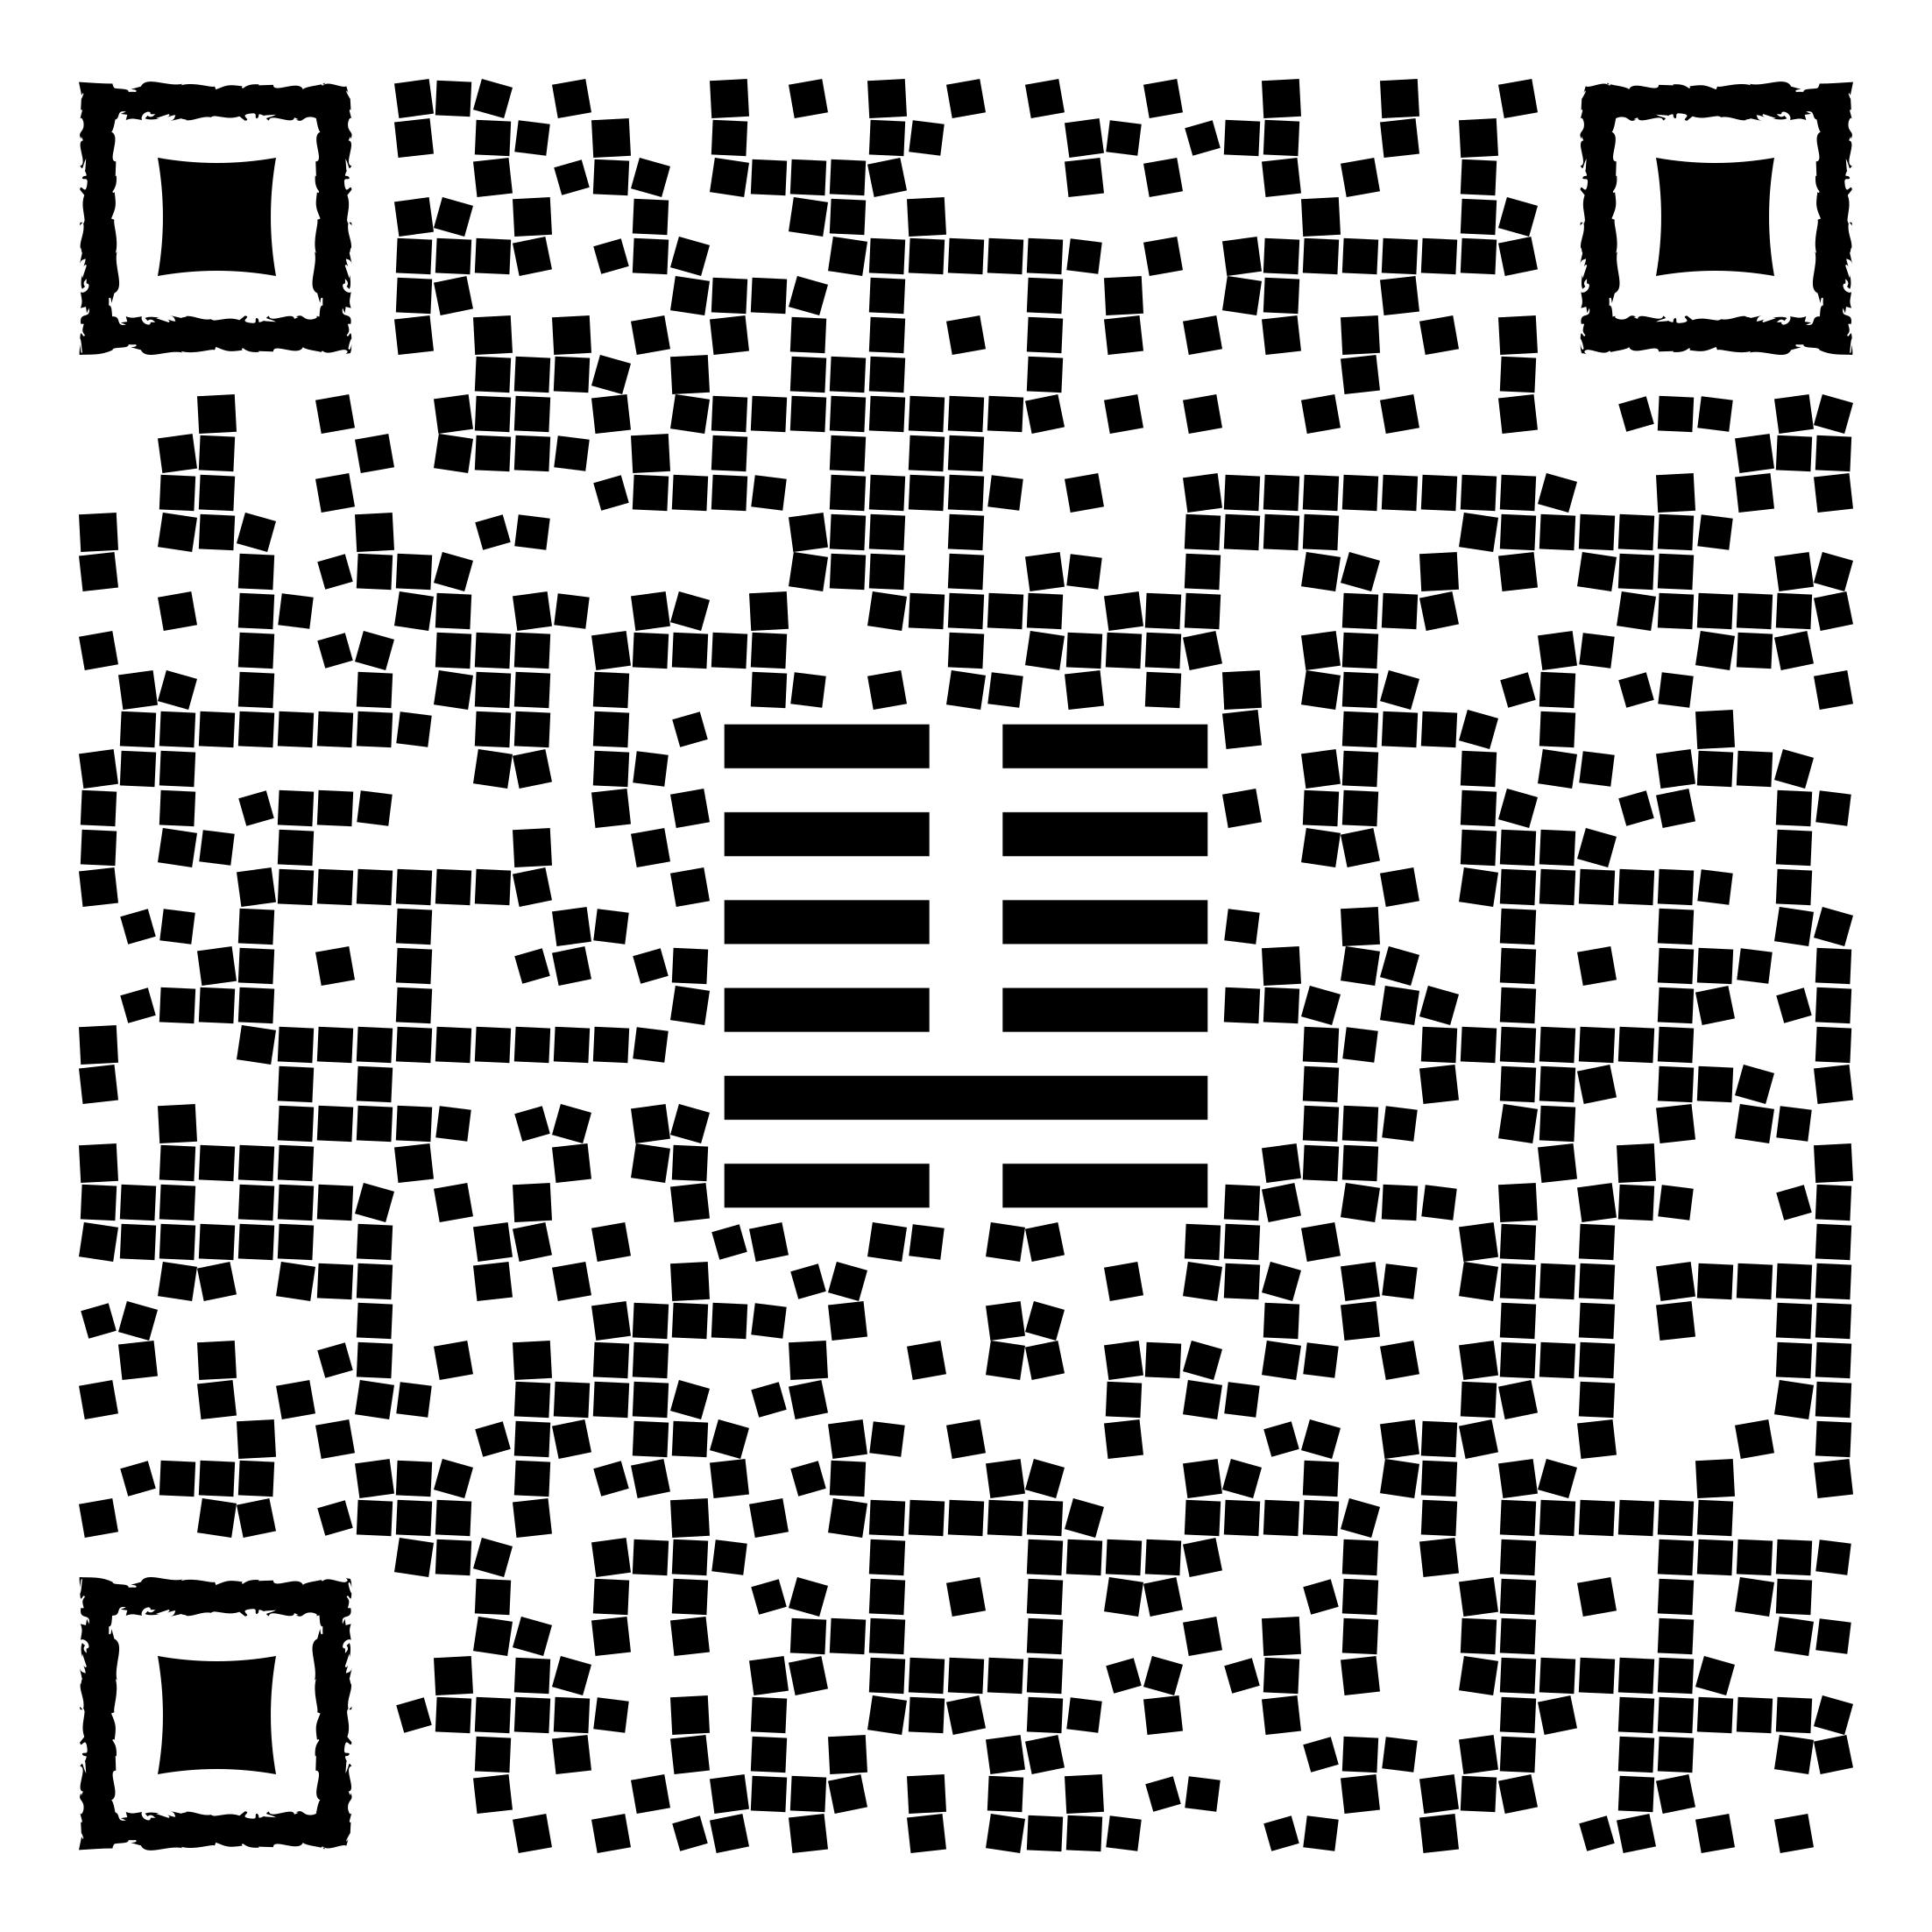 qr-code-7.png